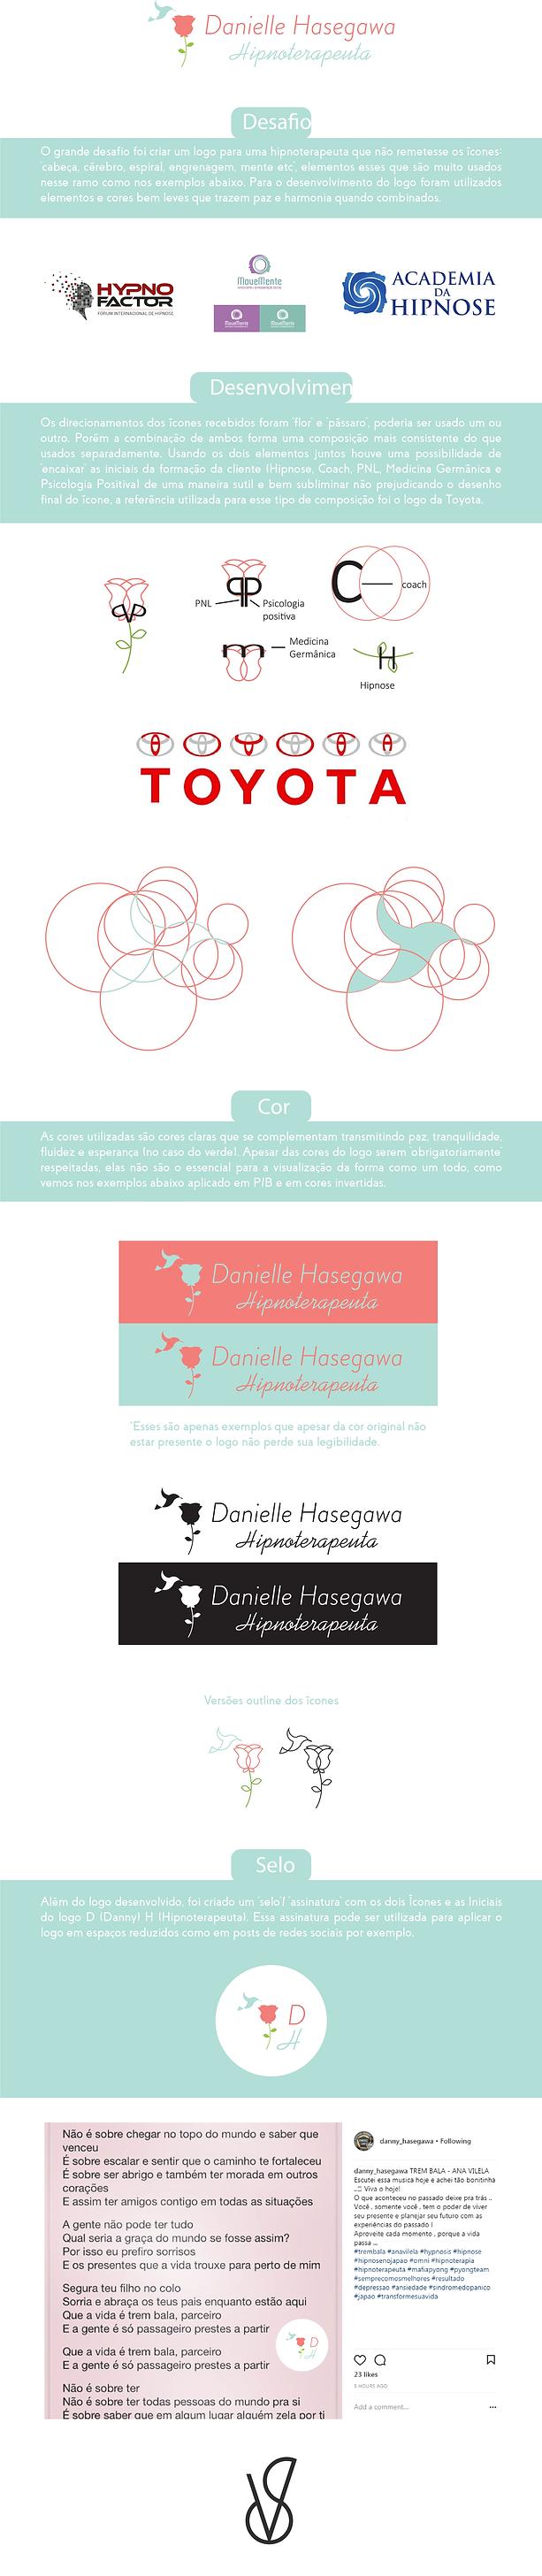 Apresentação_Logo_Danielle_Hasegawa_(log